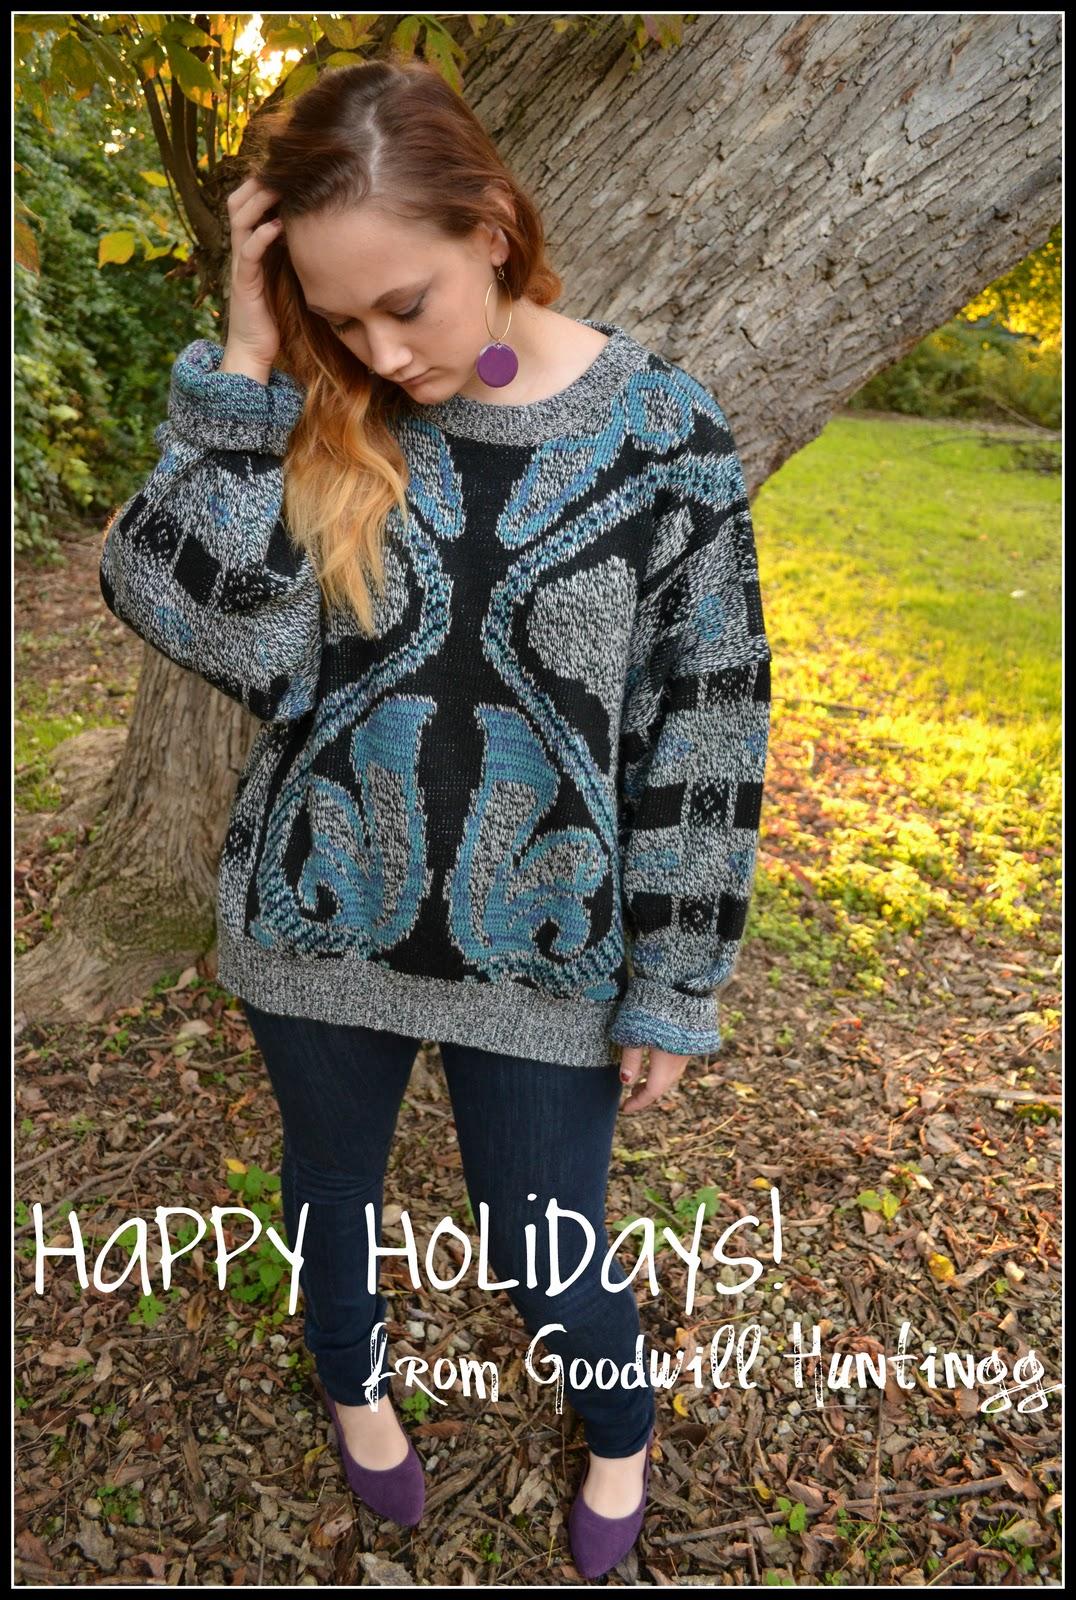 http://2.bp.blogspot.com/-K_gFm2FiFiY/TtRzPkrPS8I/AAAAAAAADno/aD2NSFiIdsE/s1600/Happy+Holidays+Goodwill+Huntingg.jpg